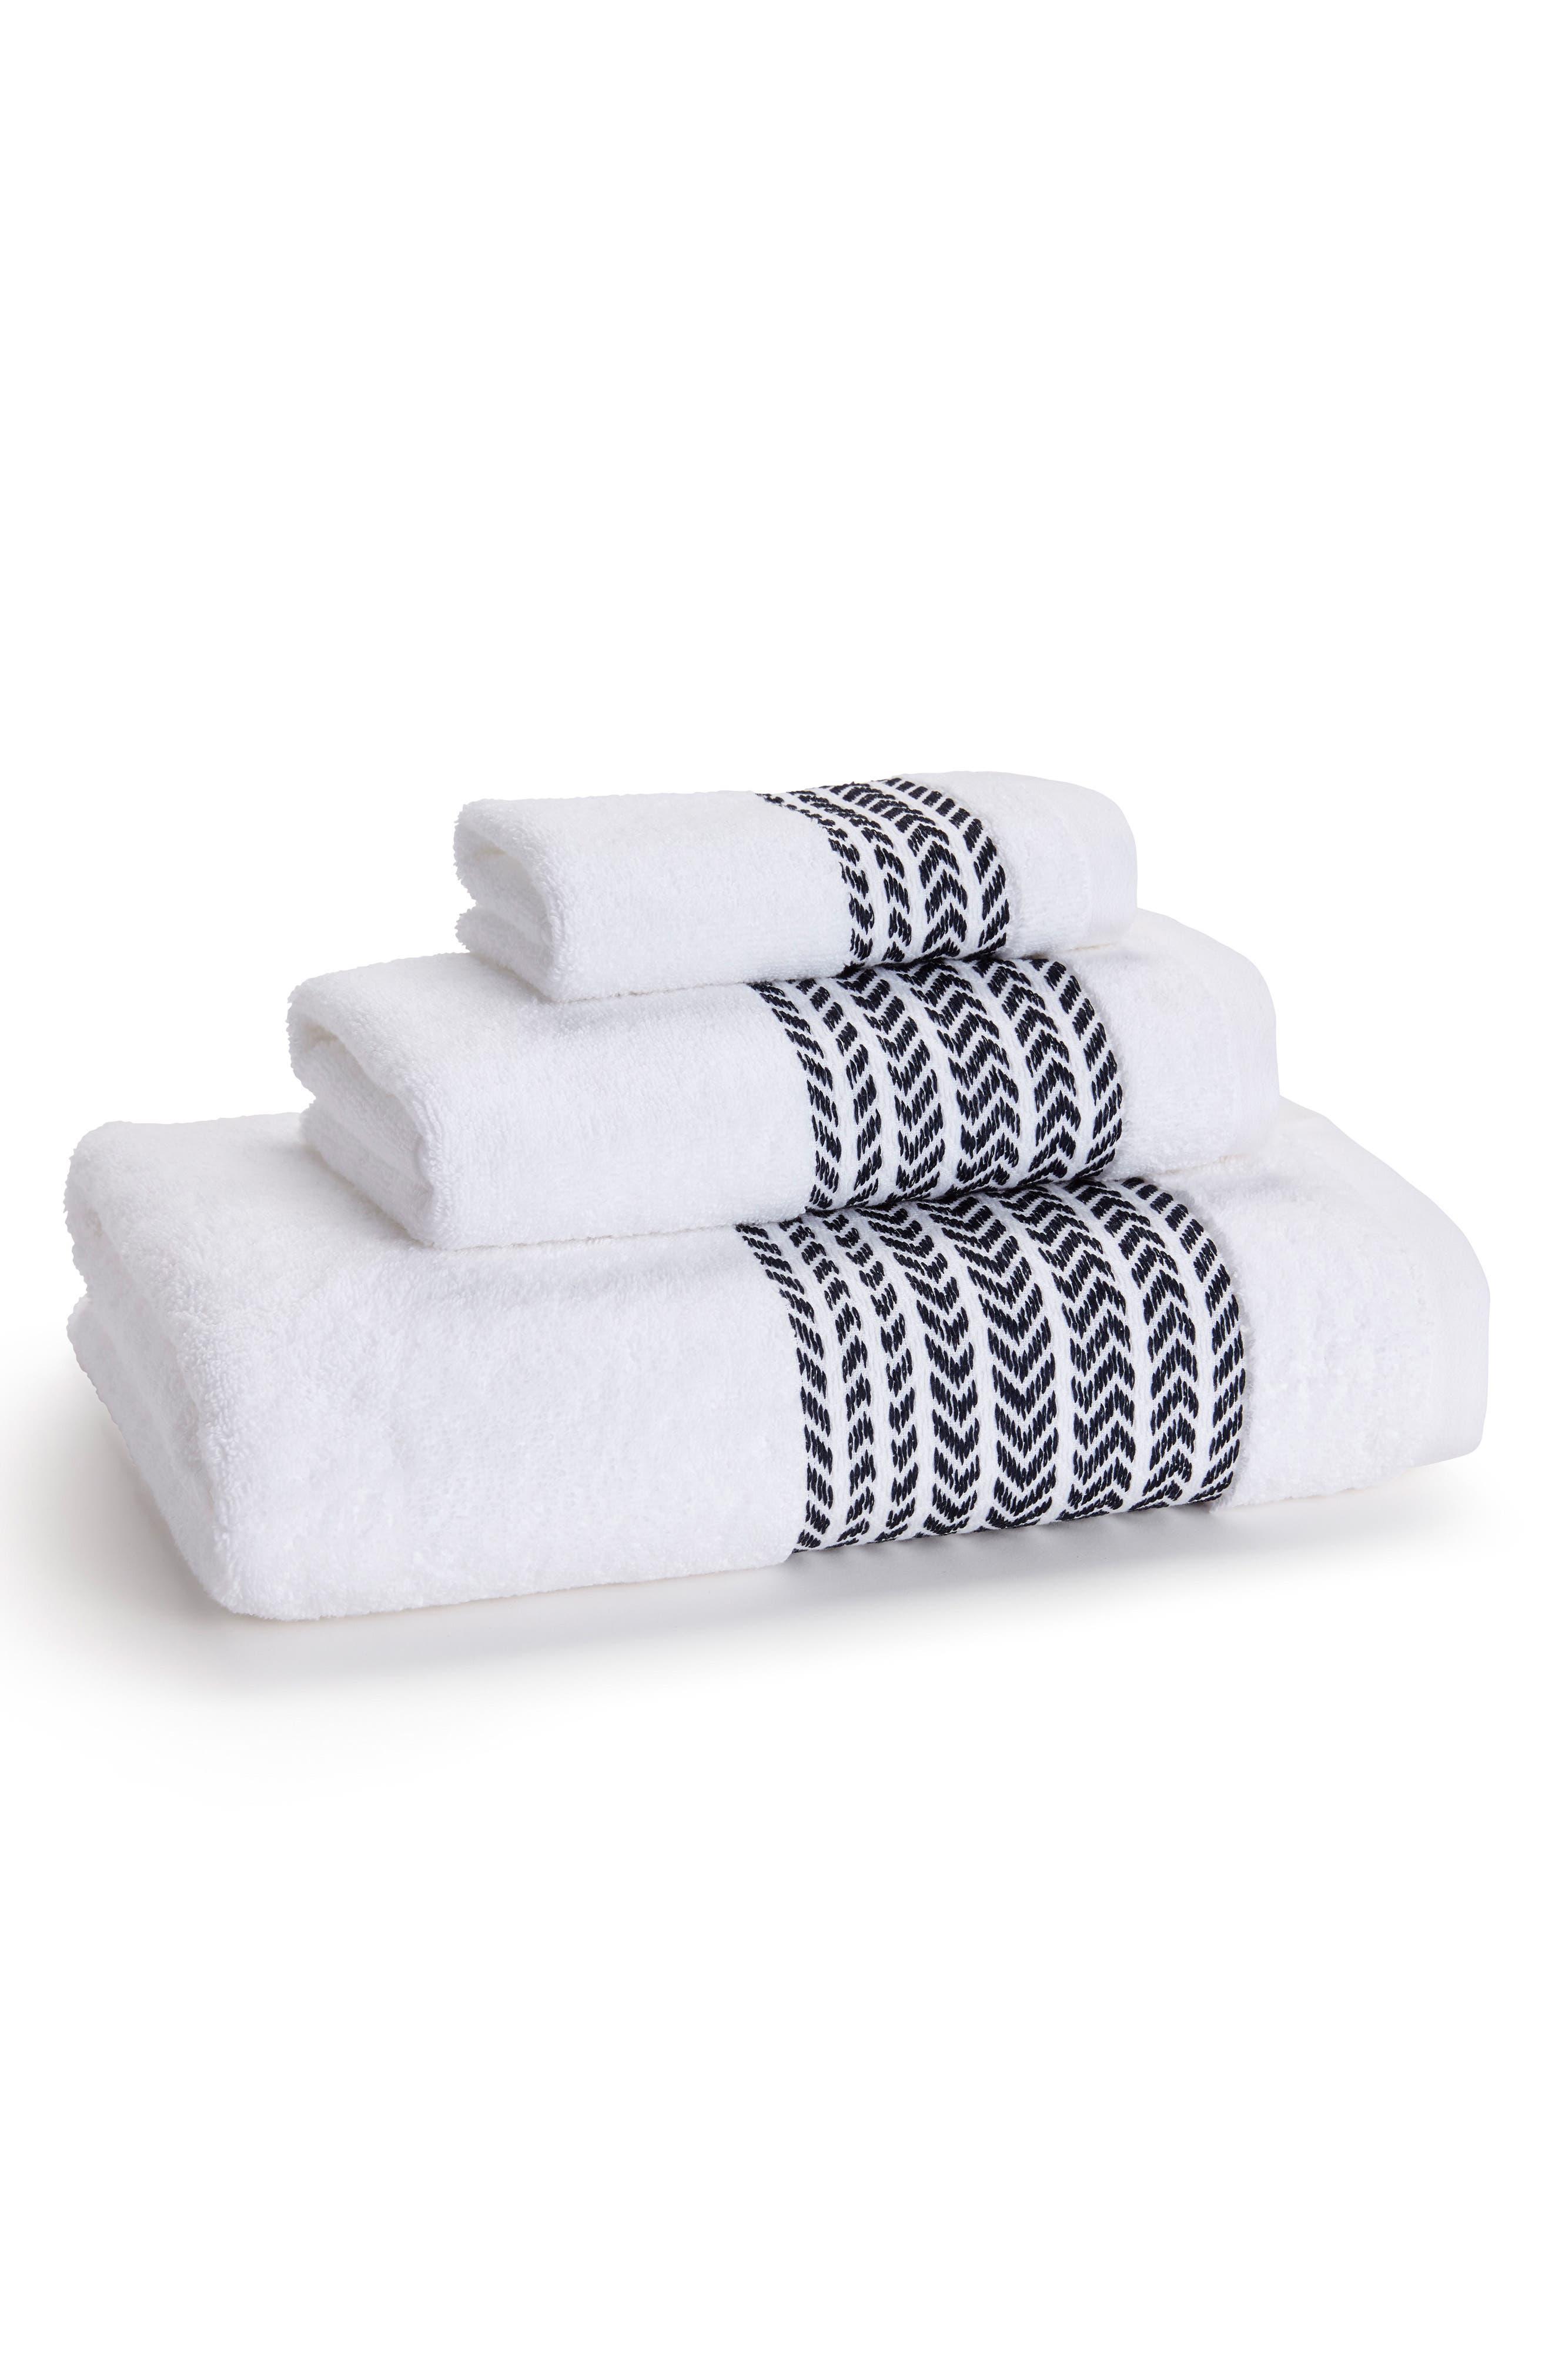 Main Image - KASSATEX Baja Bath Towel